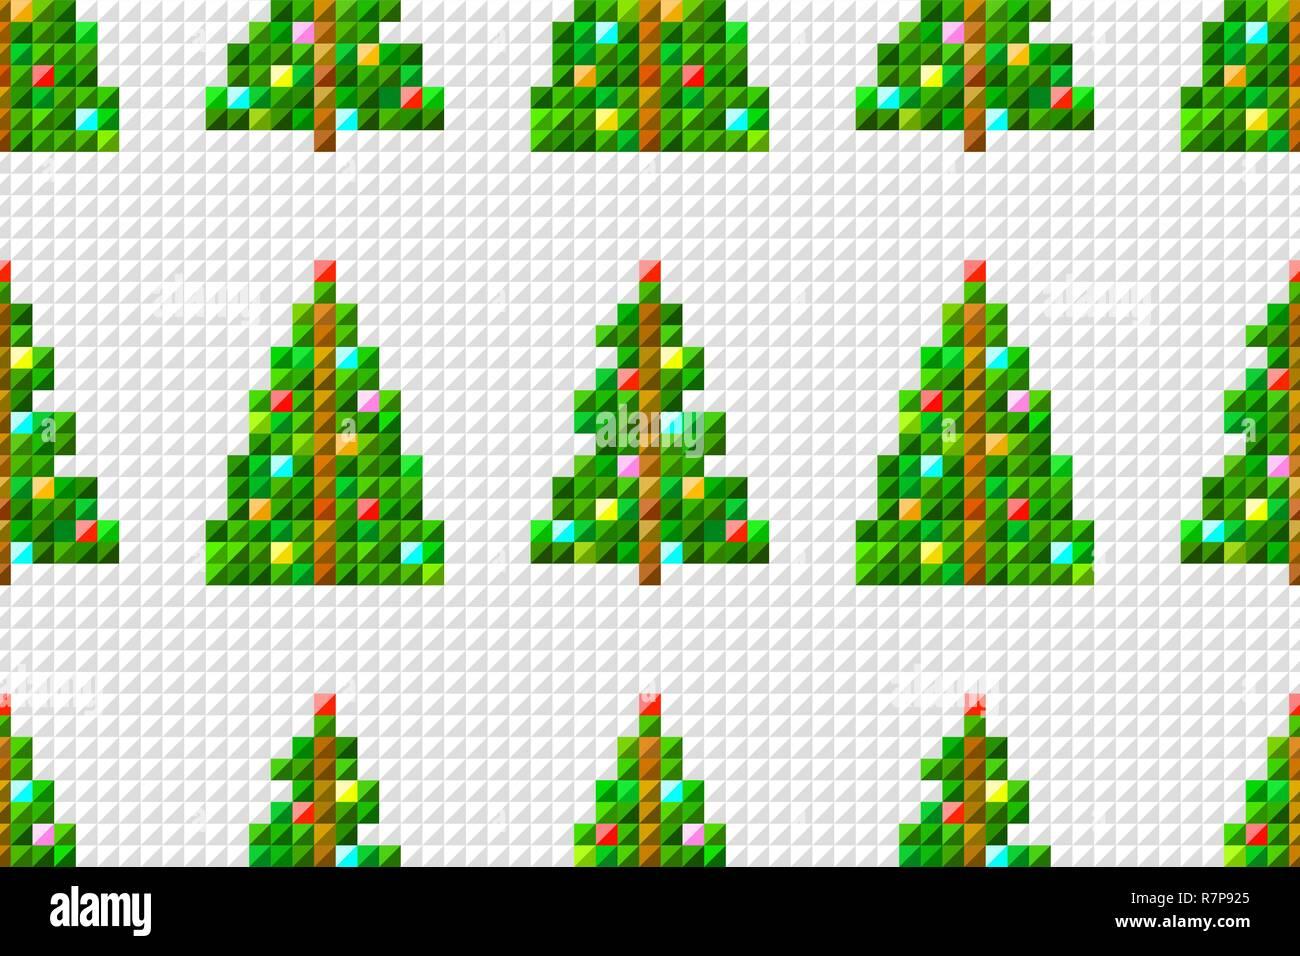 Vector Seamless Pattern Of Pixel Art Christmas Tree On Pixel